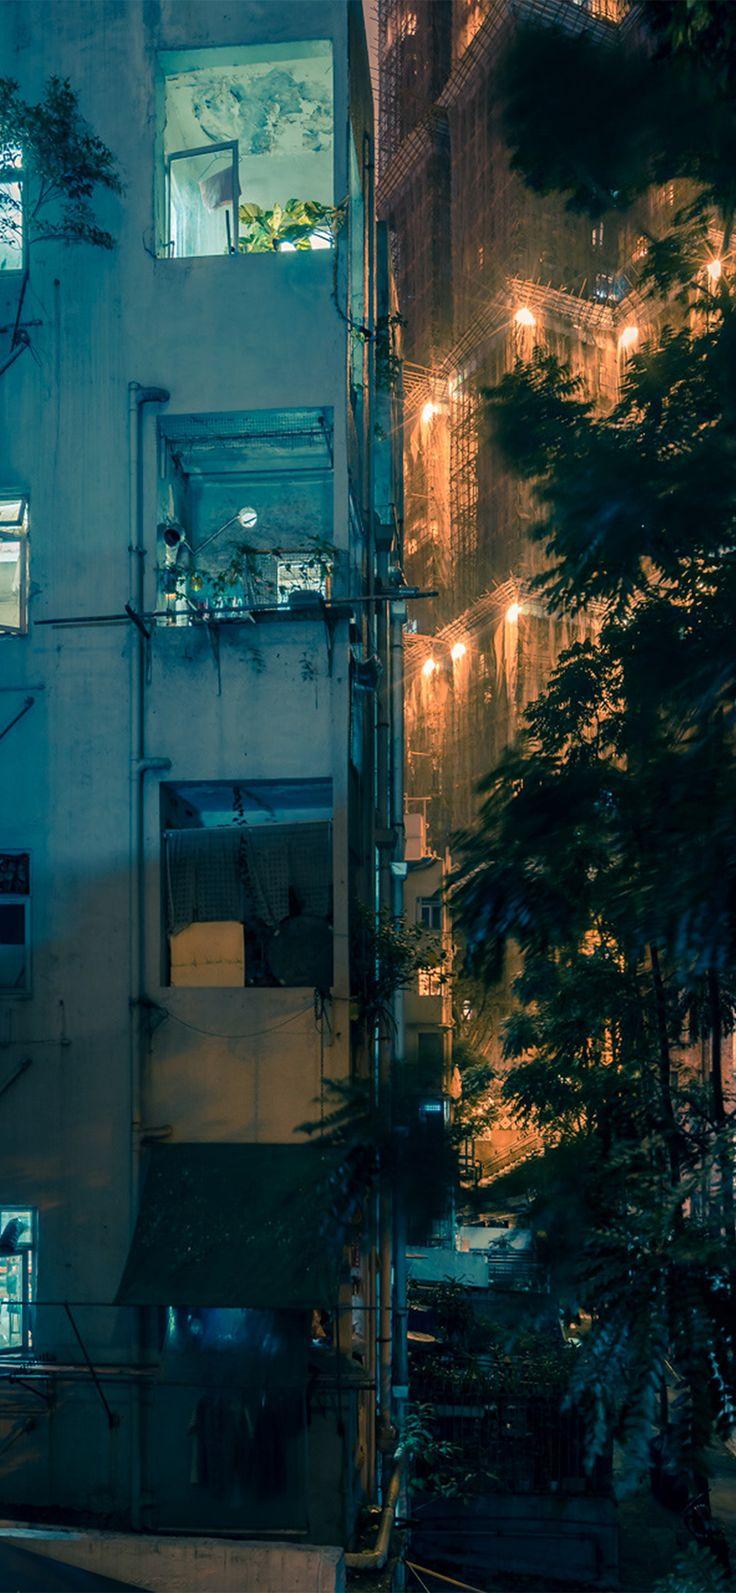 Iphone X Wallpaper Nz51 City Night Architecture Nature Via